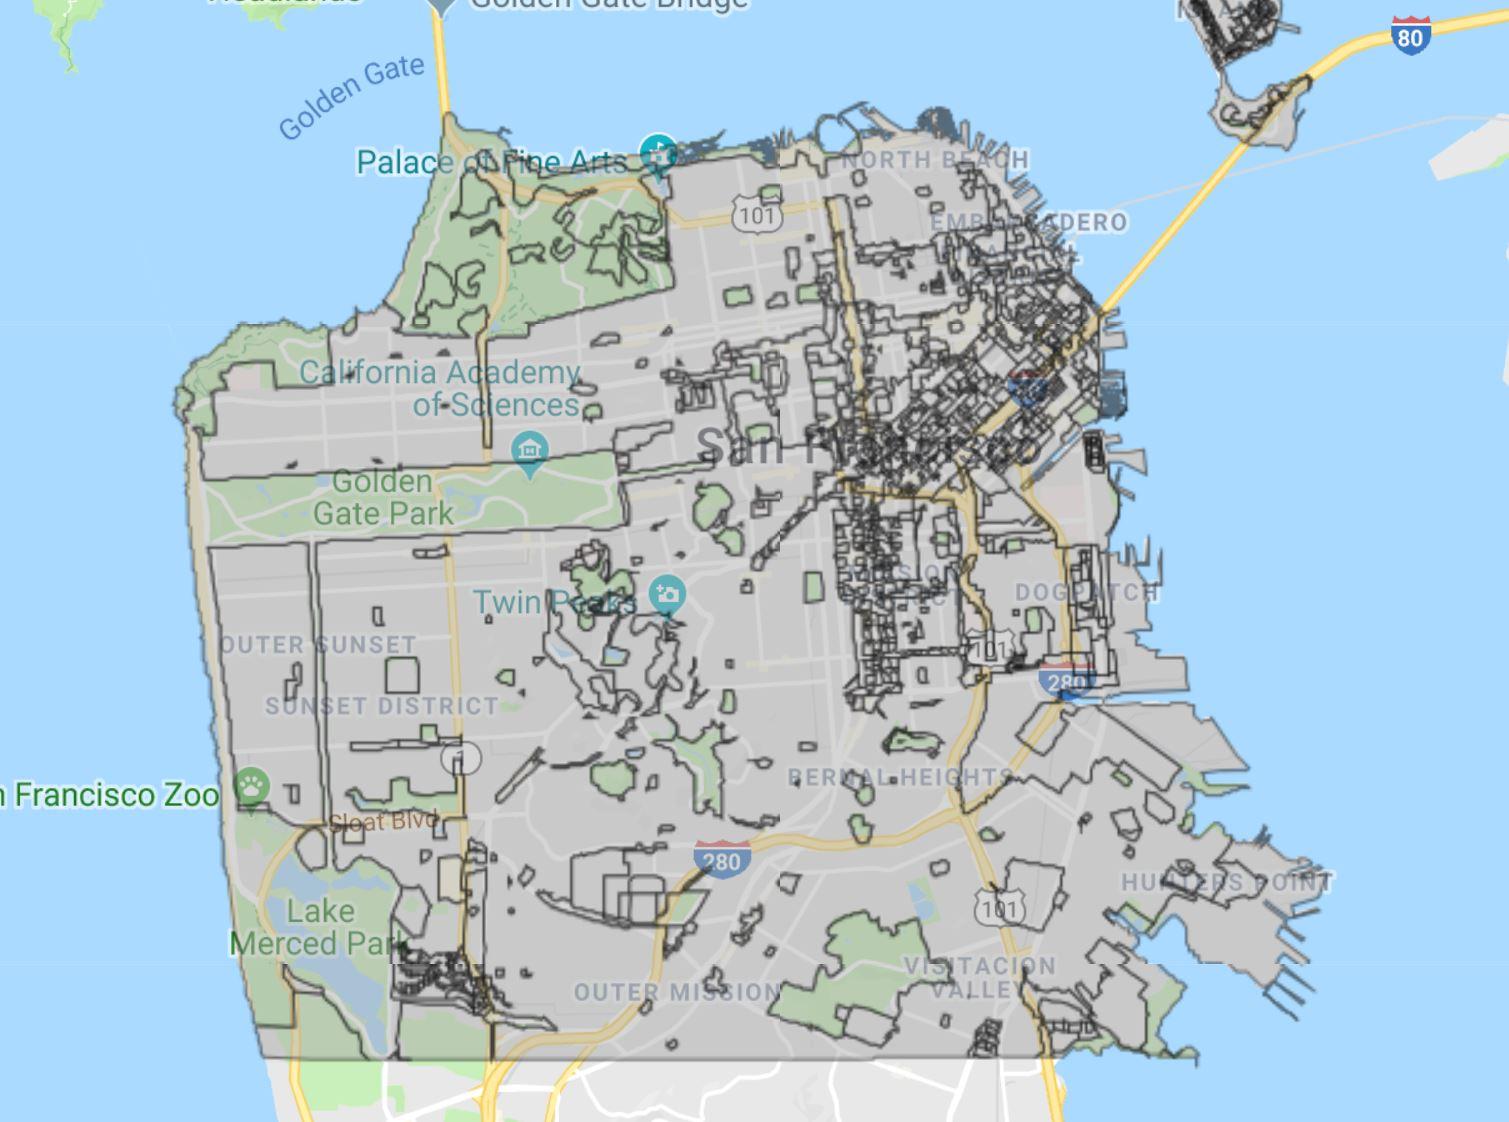 Image via Data.SFGov.Org